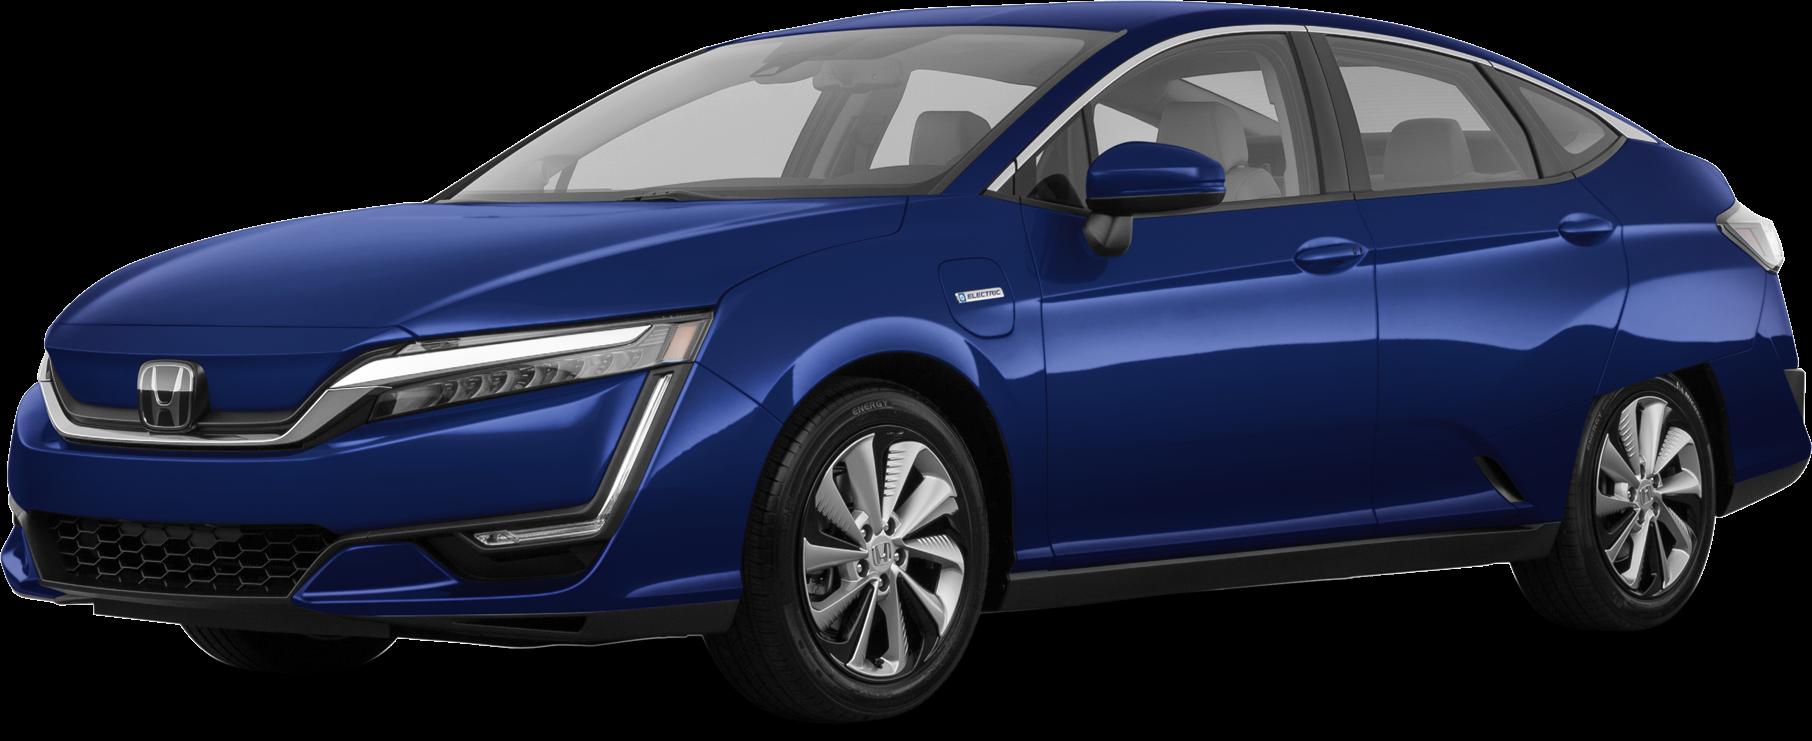 2016 Kia Optima Pricing, Reviews & Ratings | Kelley Blue Book Xe Kia Optima Wiring Diagram on